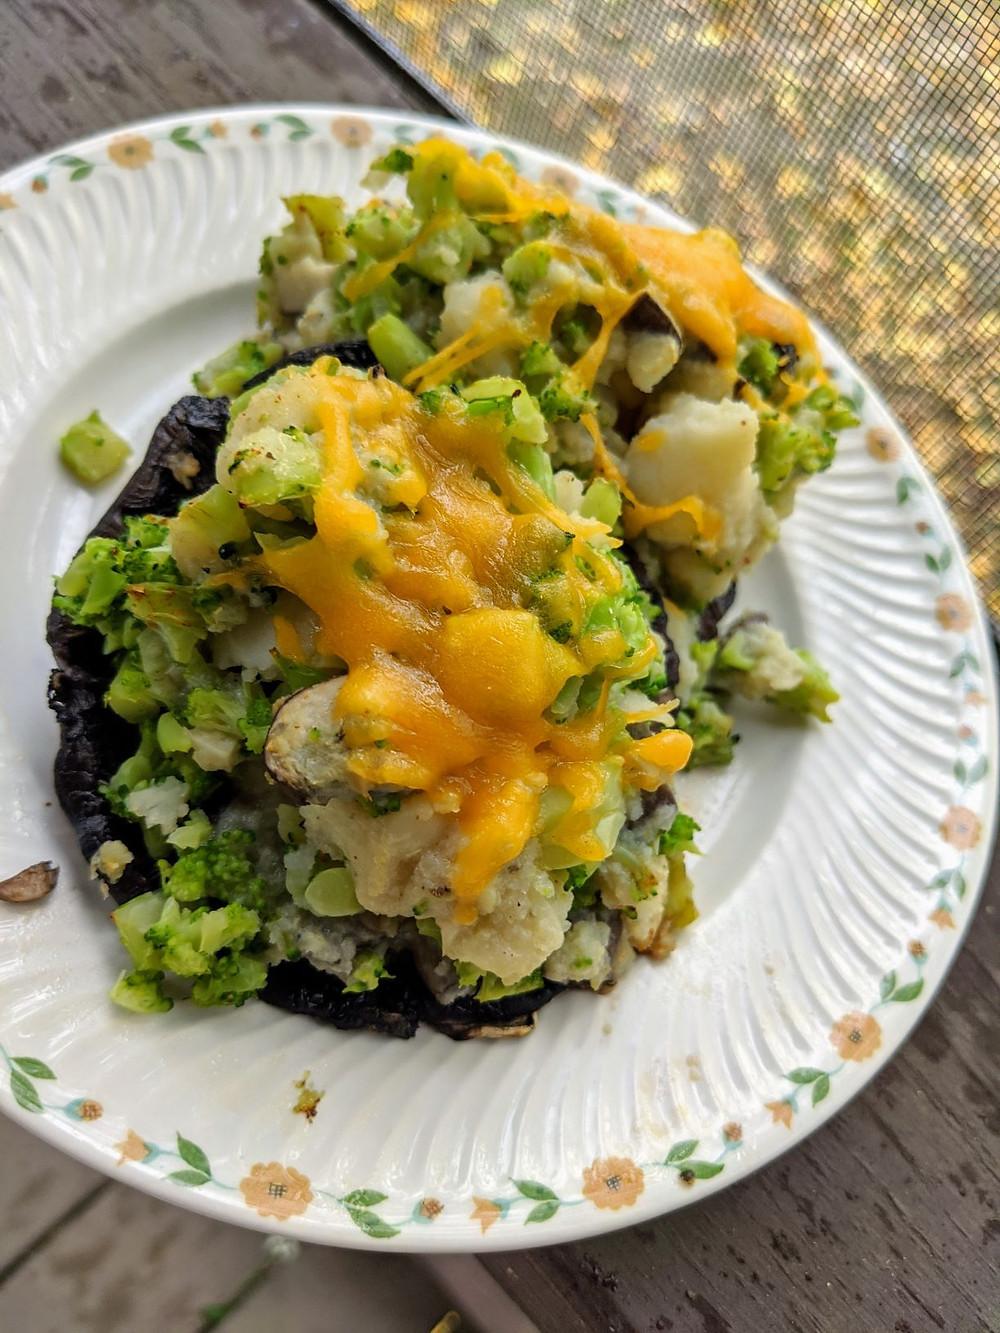 Mashed Potato and Broccoli Stuffed Portobellos